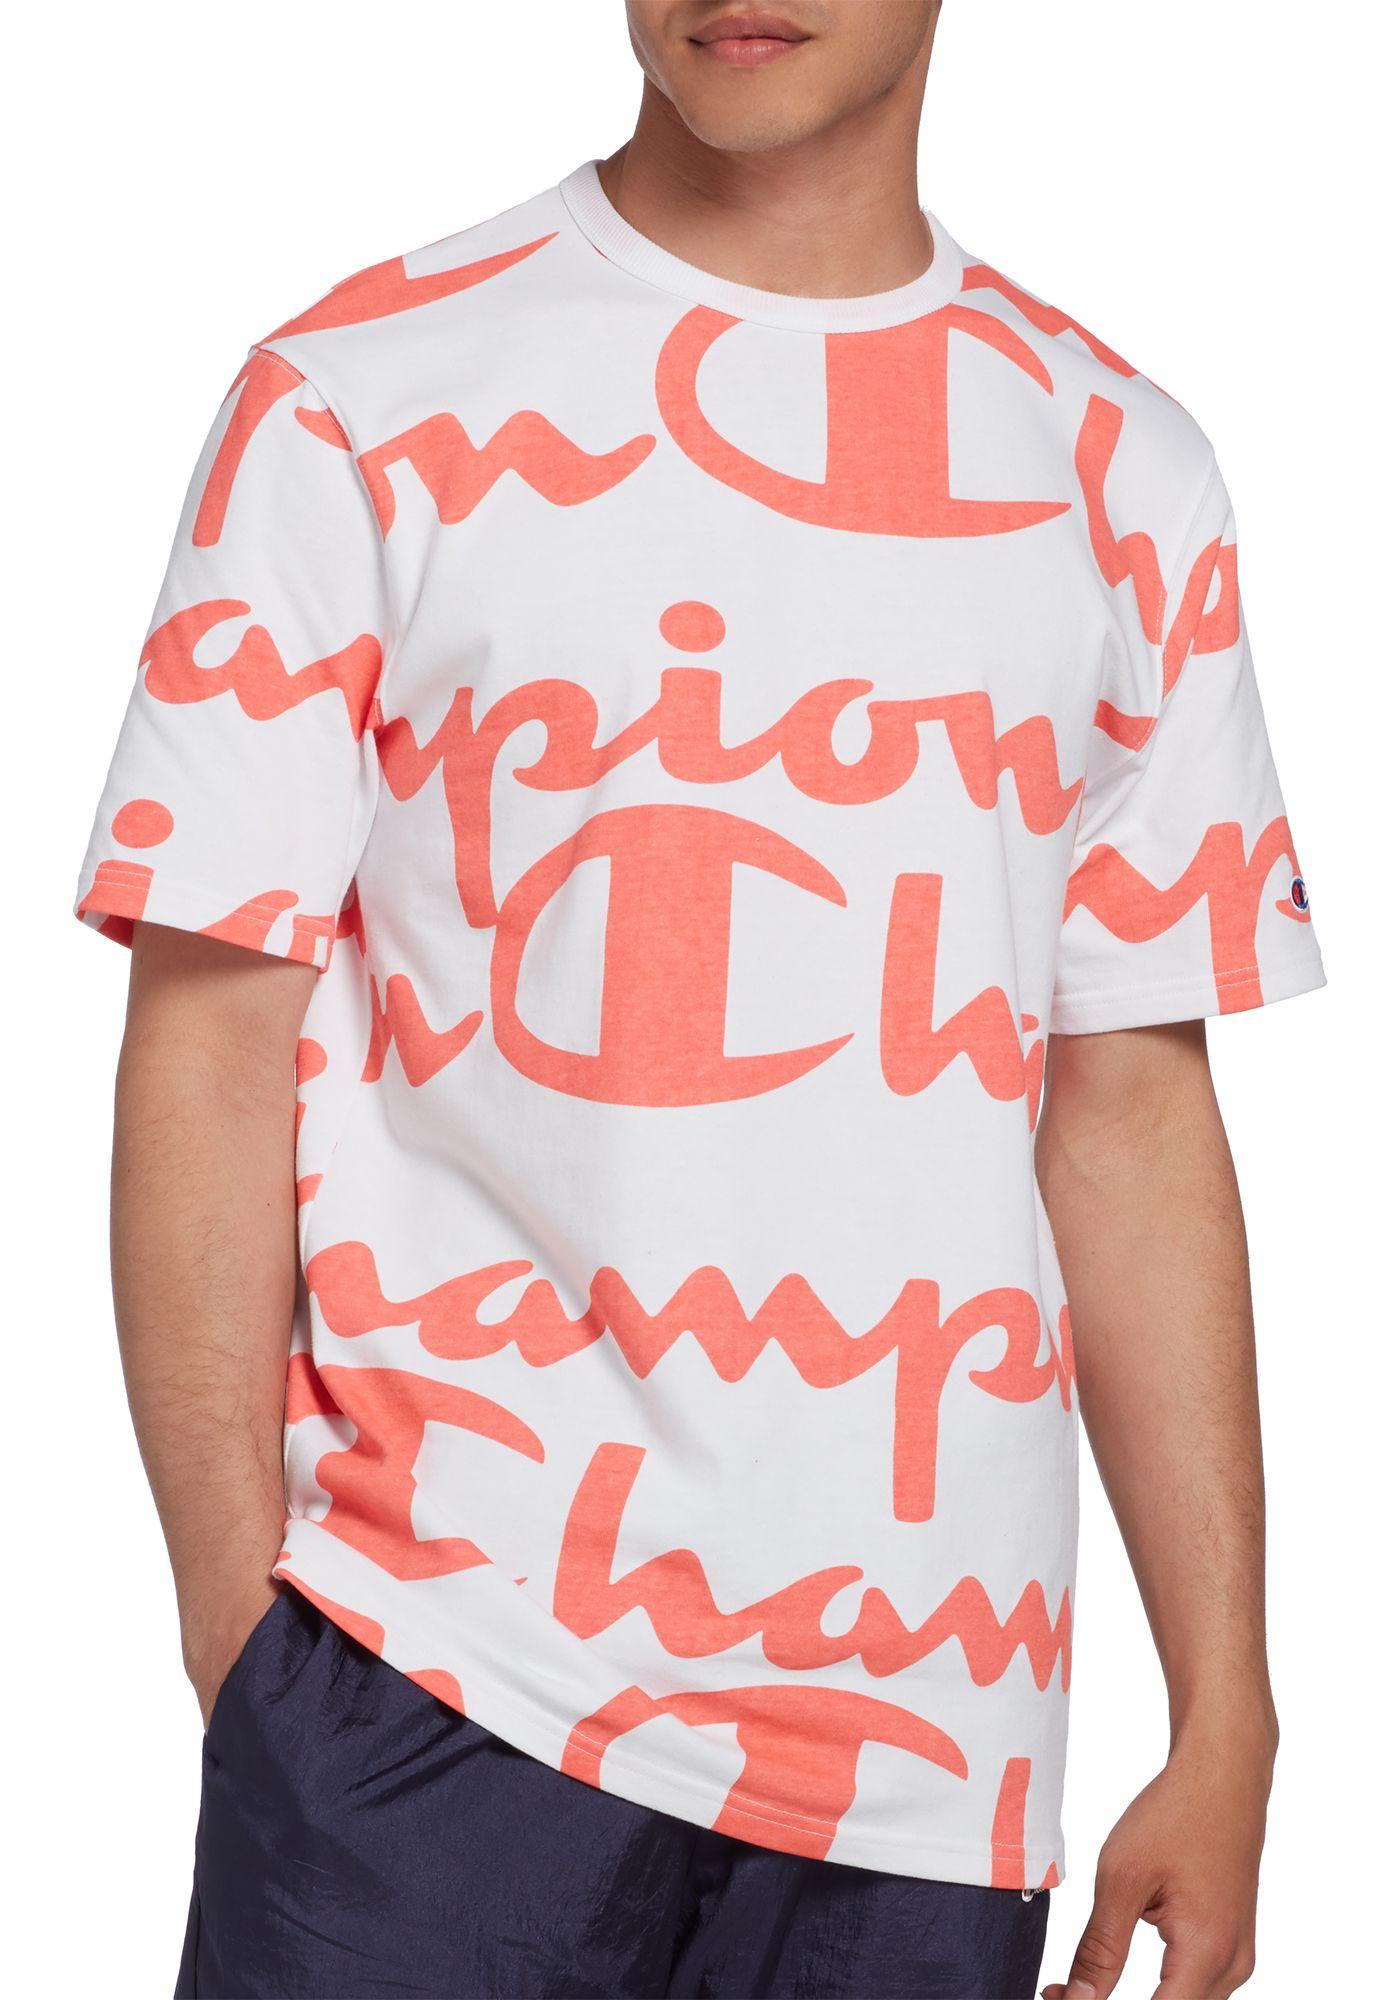 Champion Life Men's Heritage Allover Print Tee